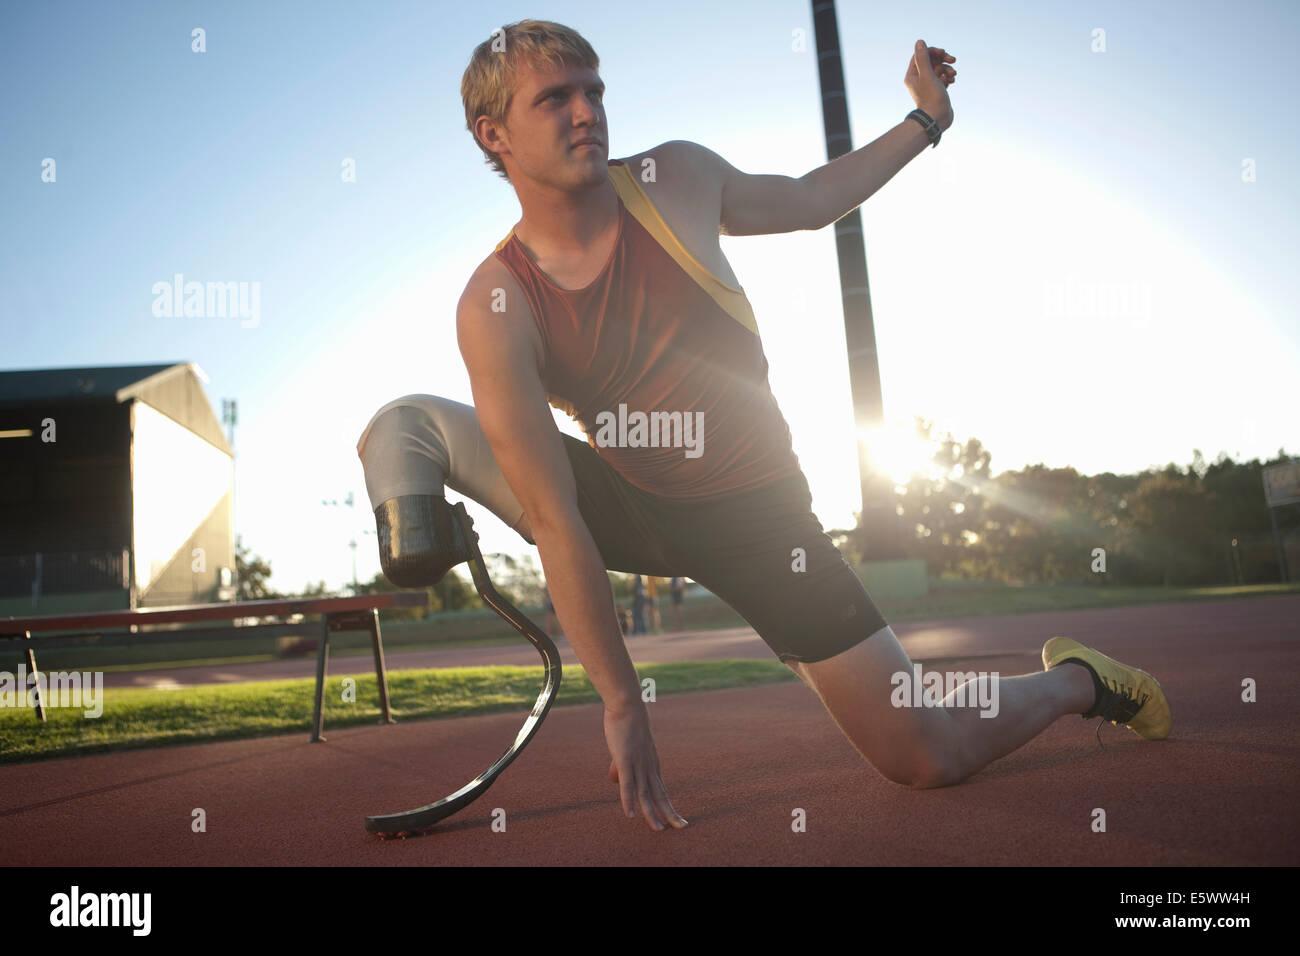 Sprinter stretching - Stock Image